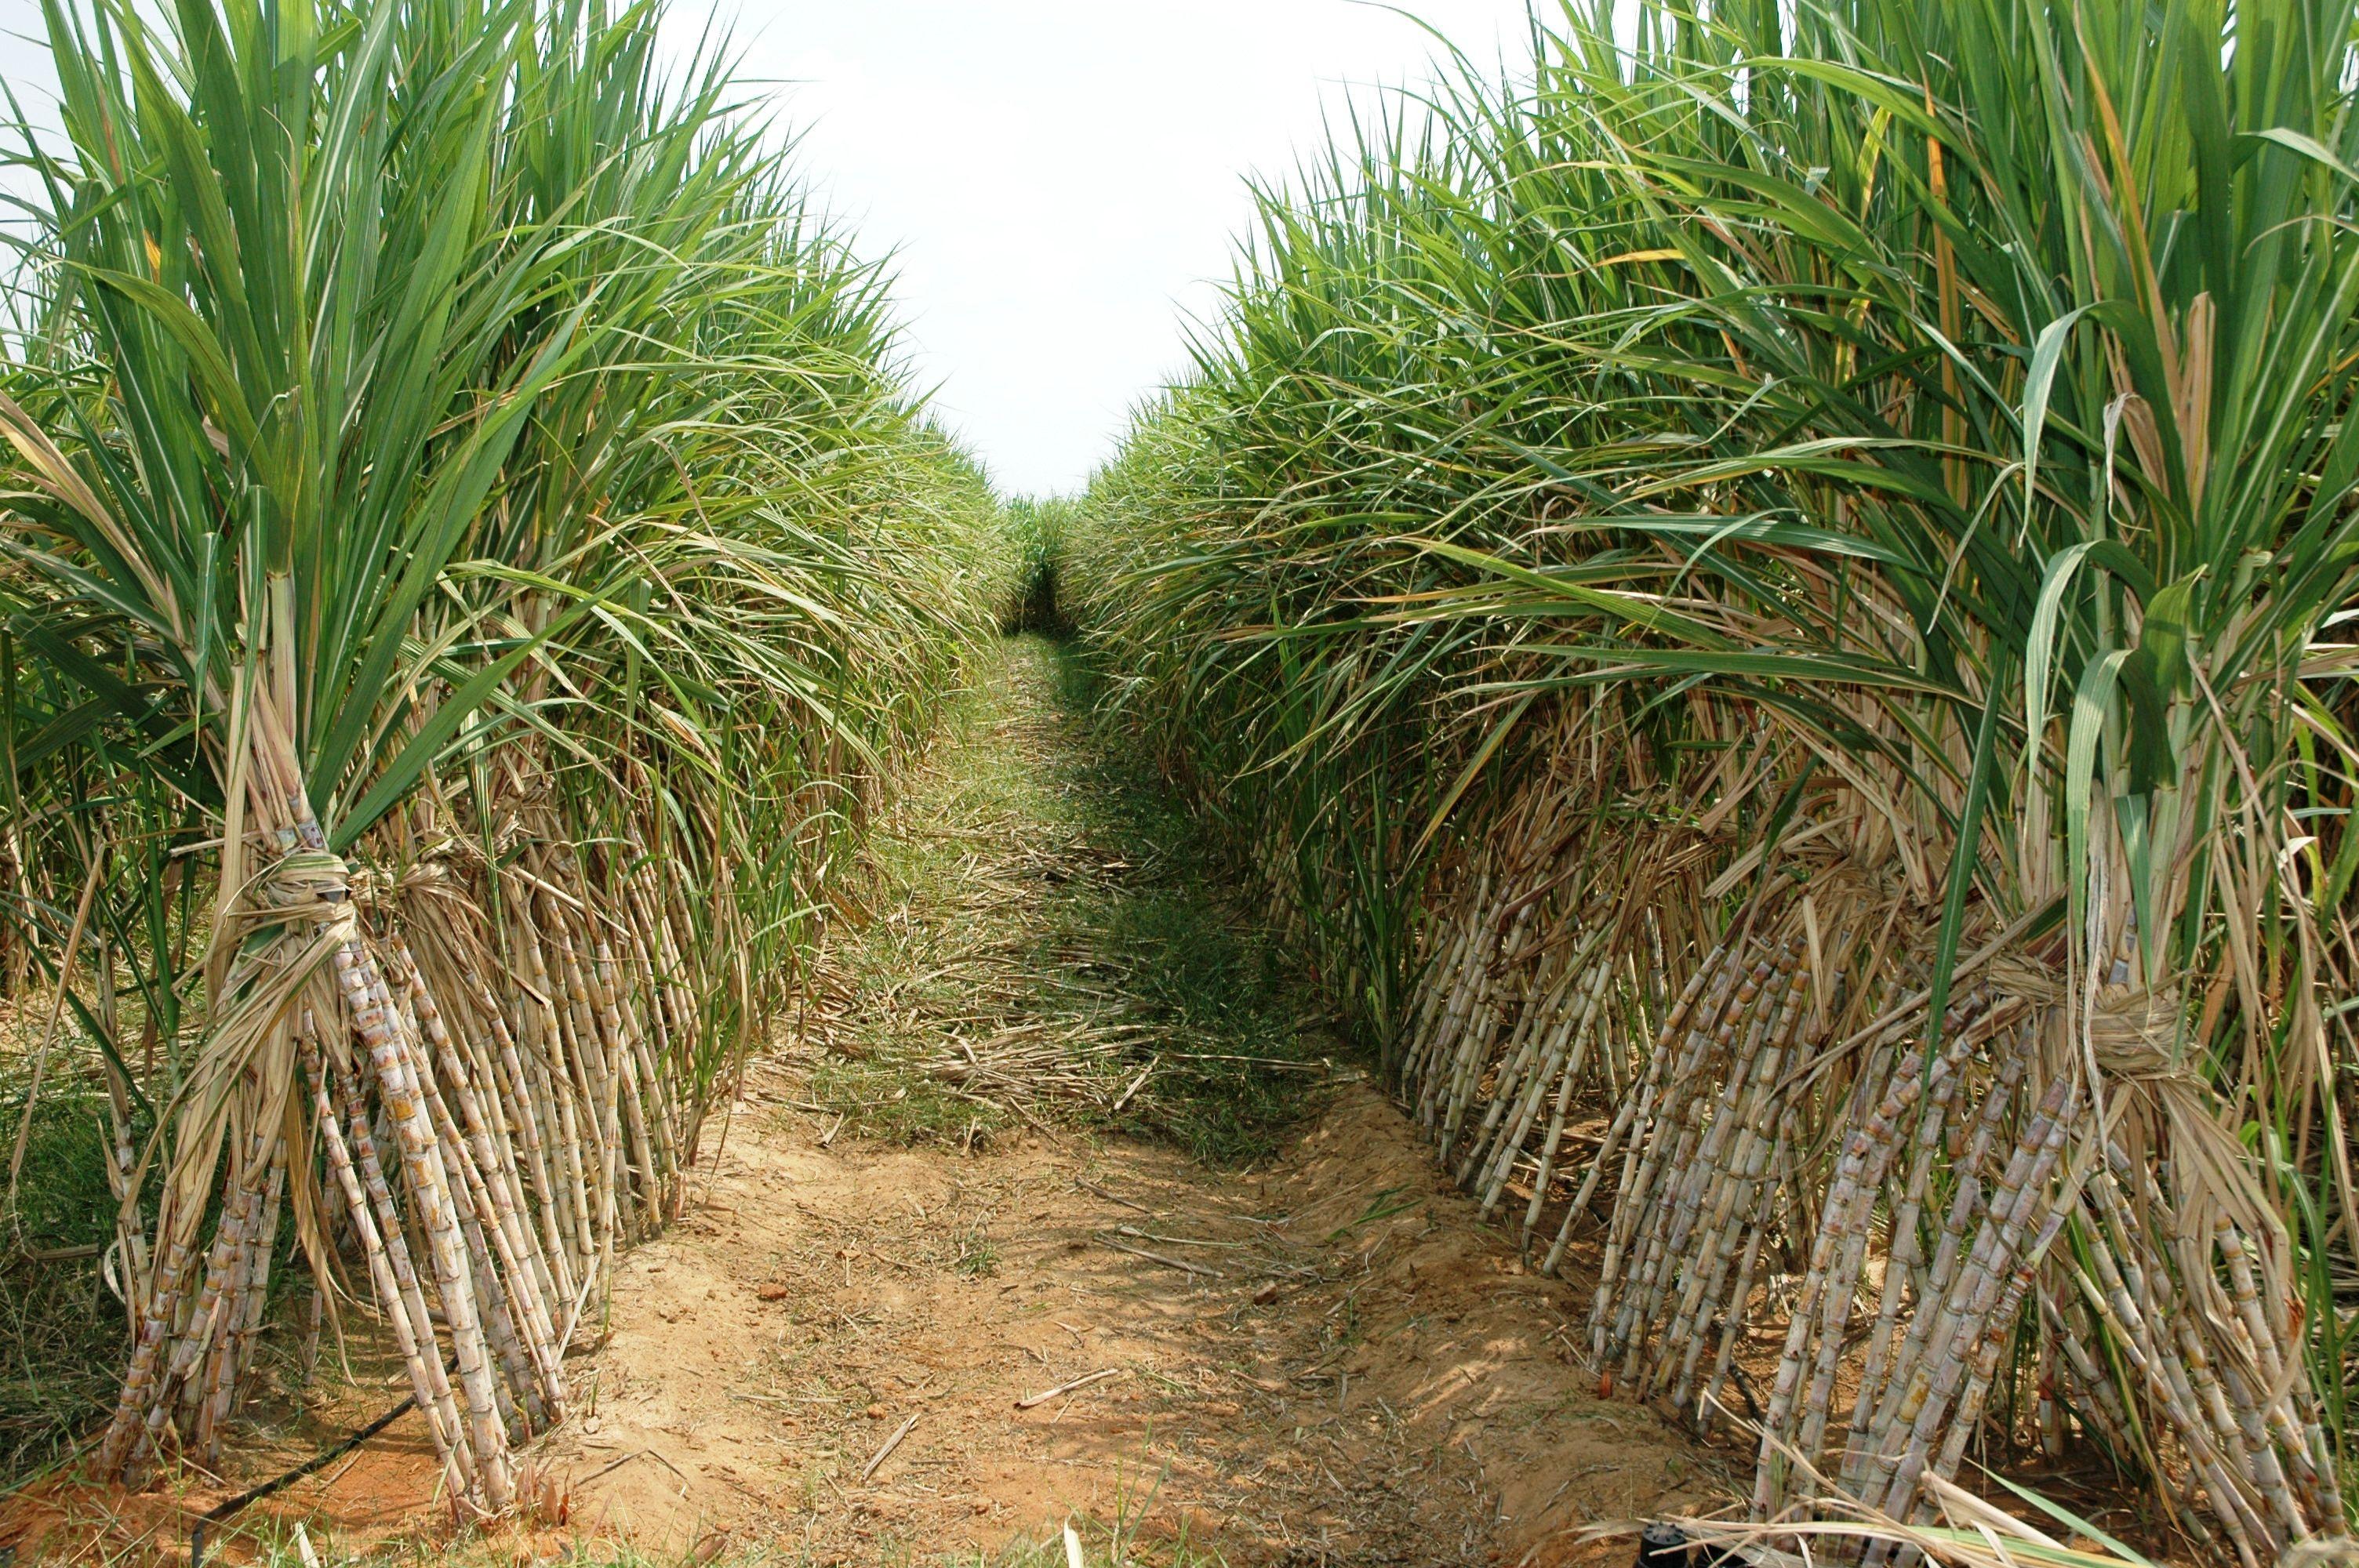 Momentum Biofuels (MMBF) Rockets 1,170% Without News On 12 Million Volume